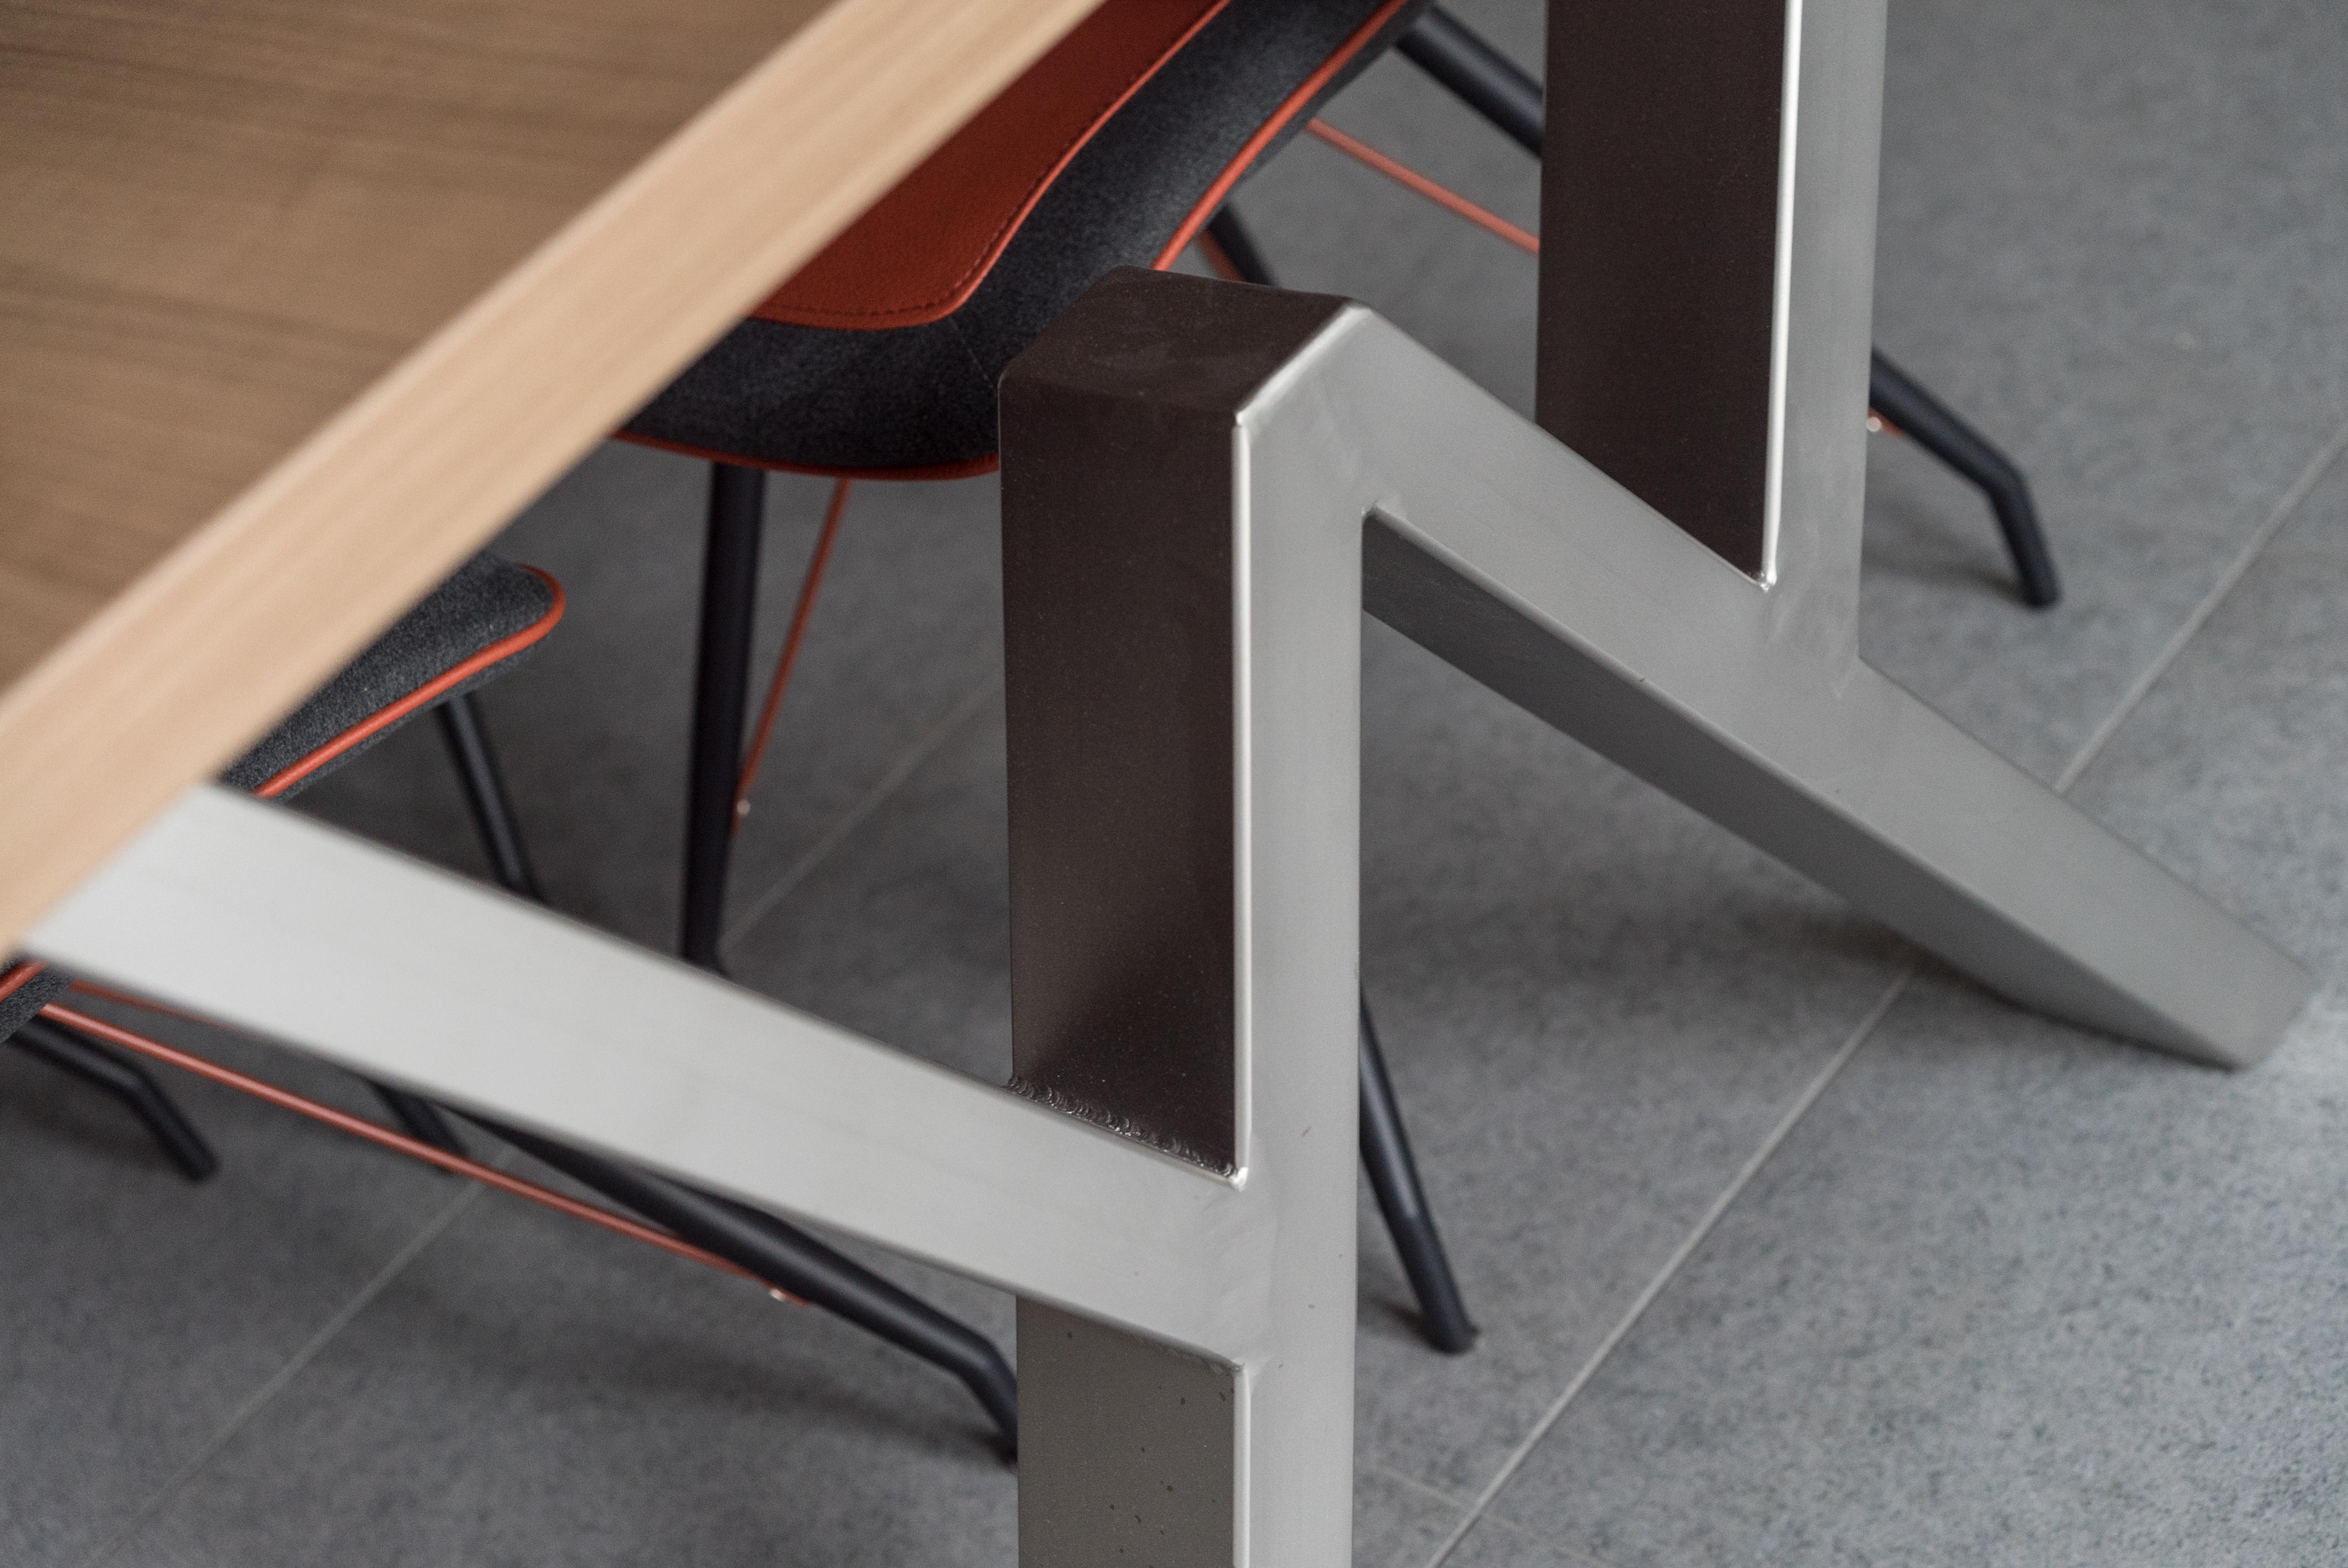 Design apparaten fabrikage waalwijk bv for Fvb interieur designs bv